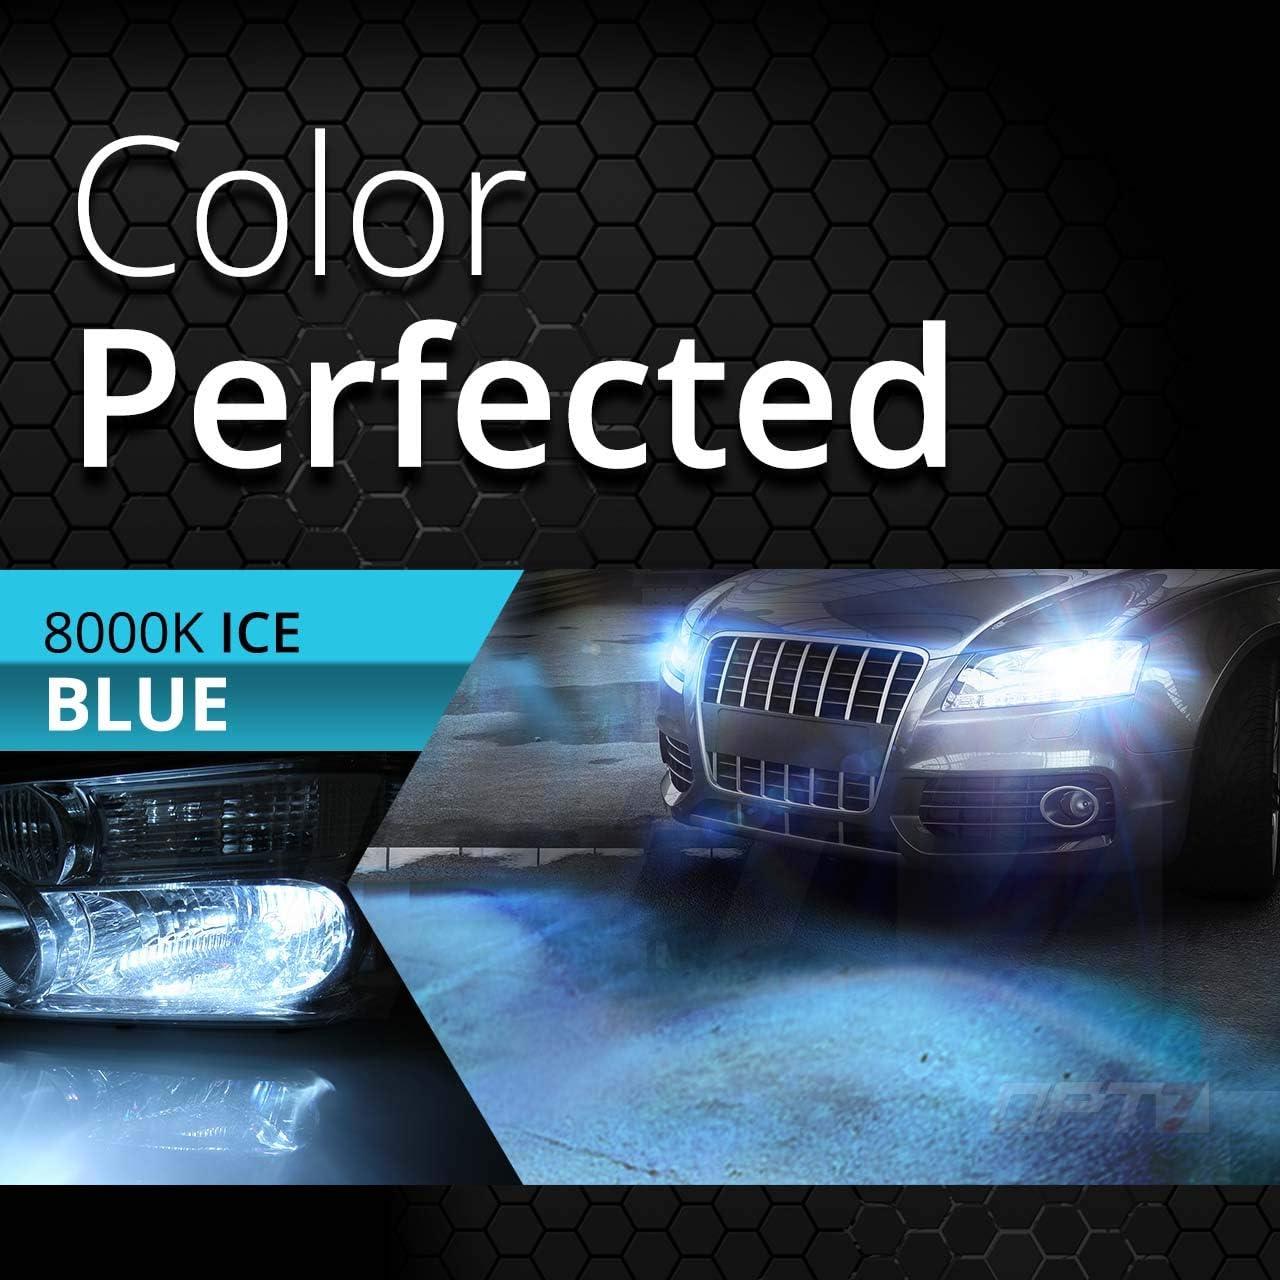 2 Yr Warranty All Bulb Sizes and Colors 4X Longer Life 3X Brighter 8000K Ice Blue Light OPT7 BLTZ 55W 9007 Bi-Xenon HID Kit